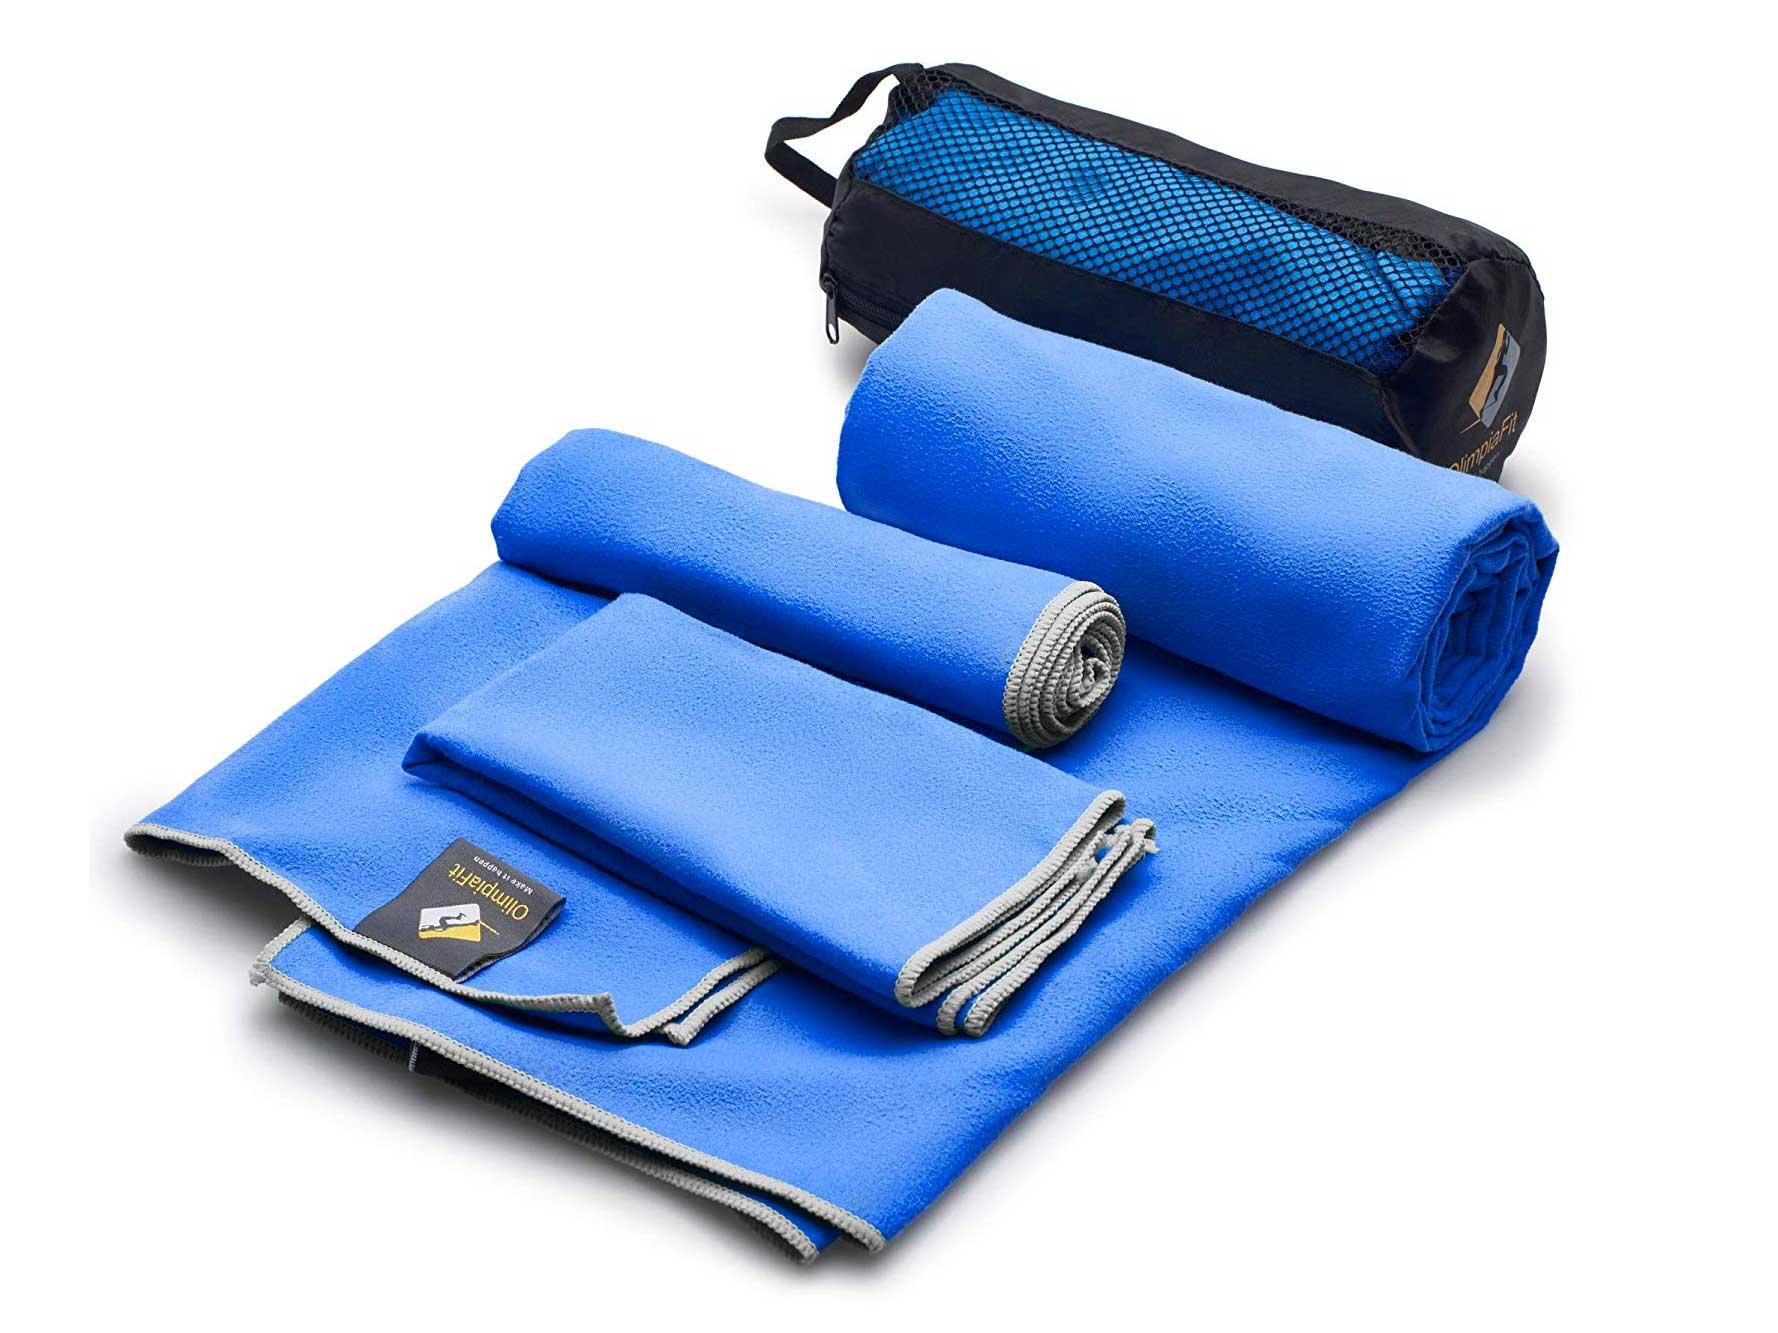 Blue microfiber towel